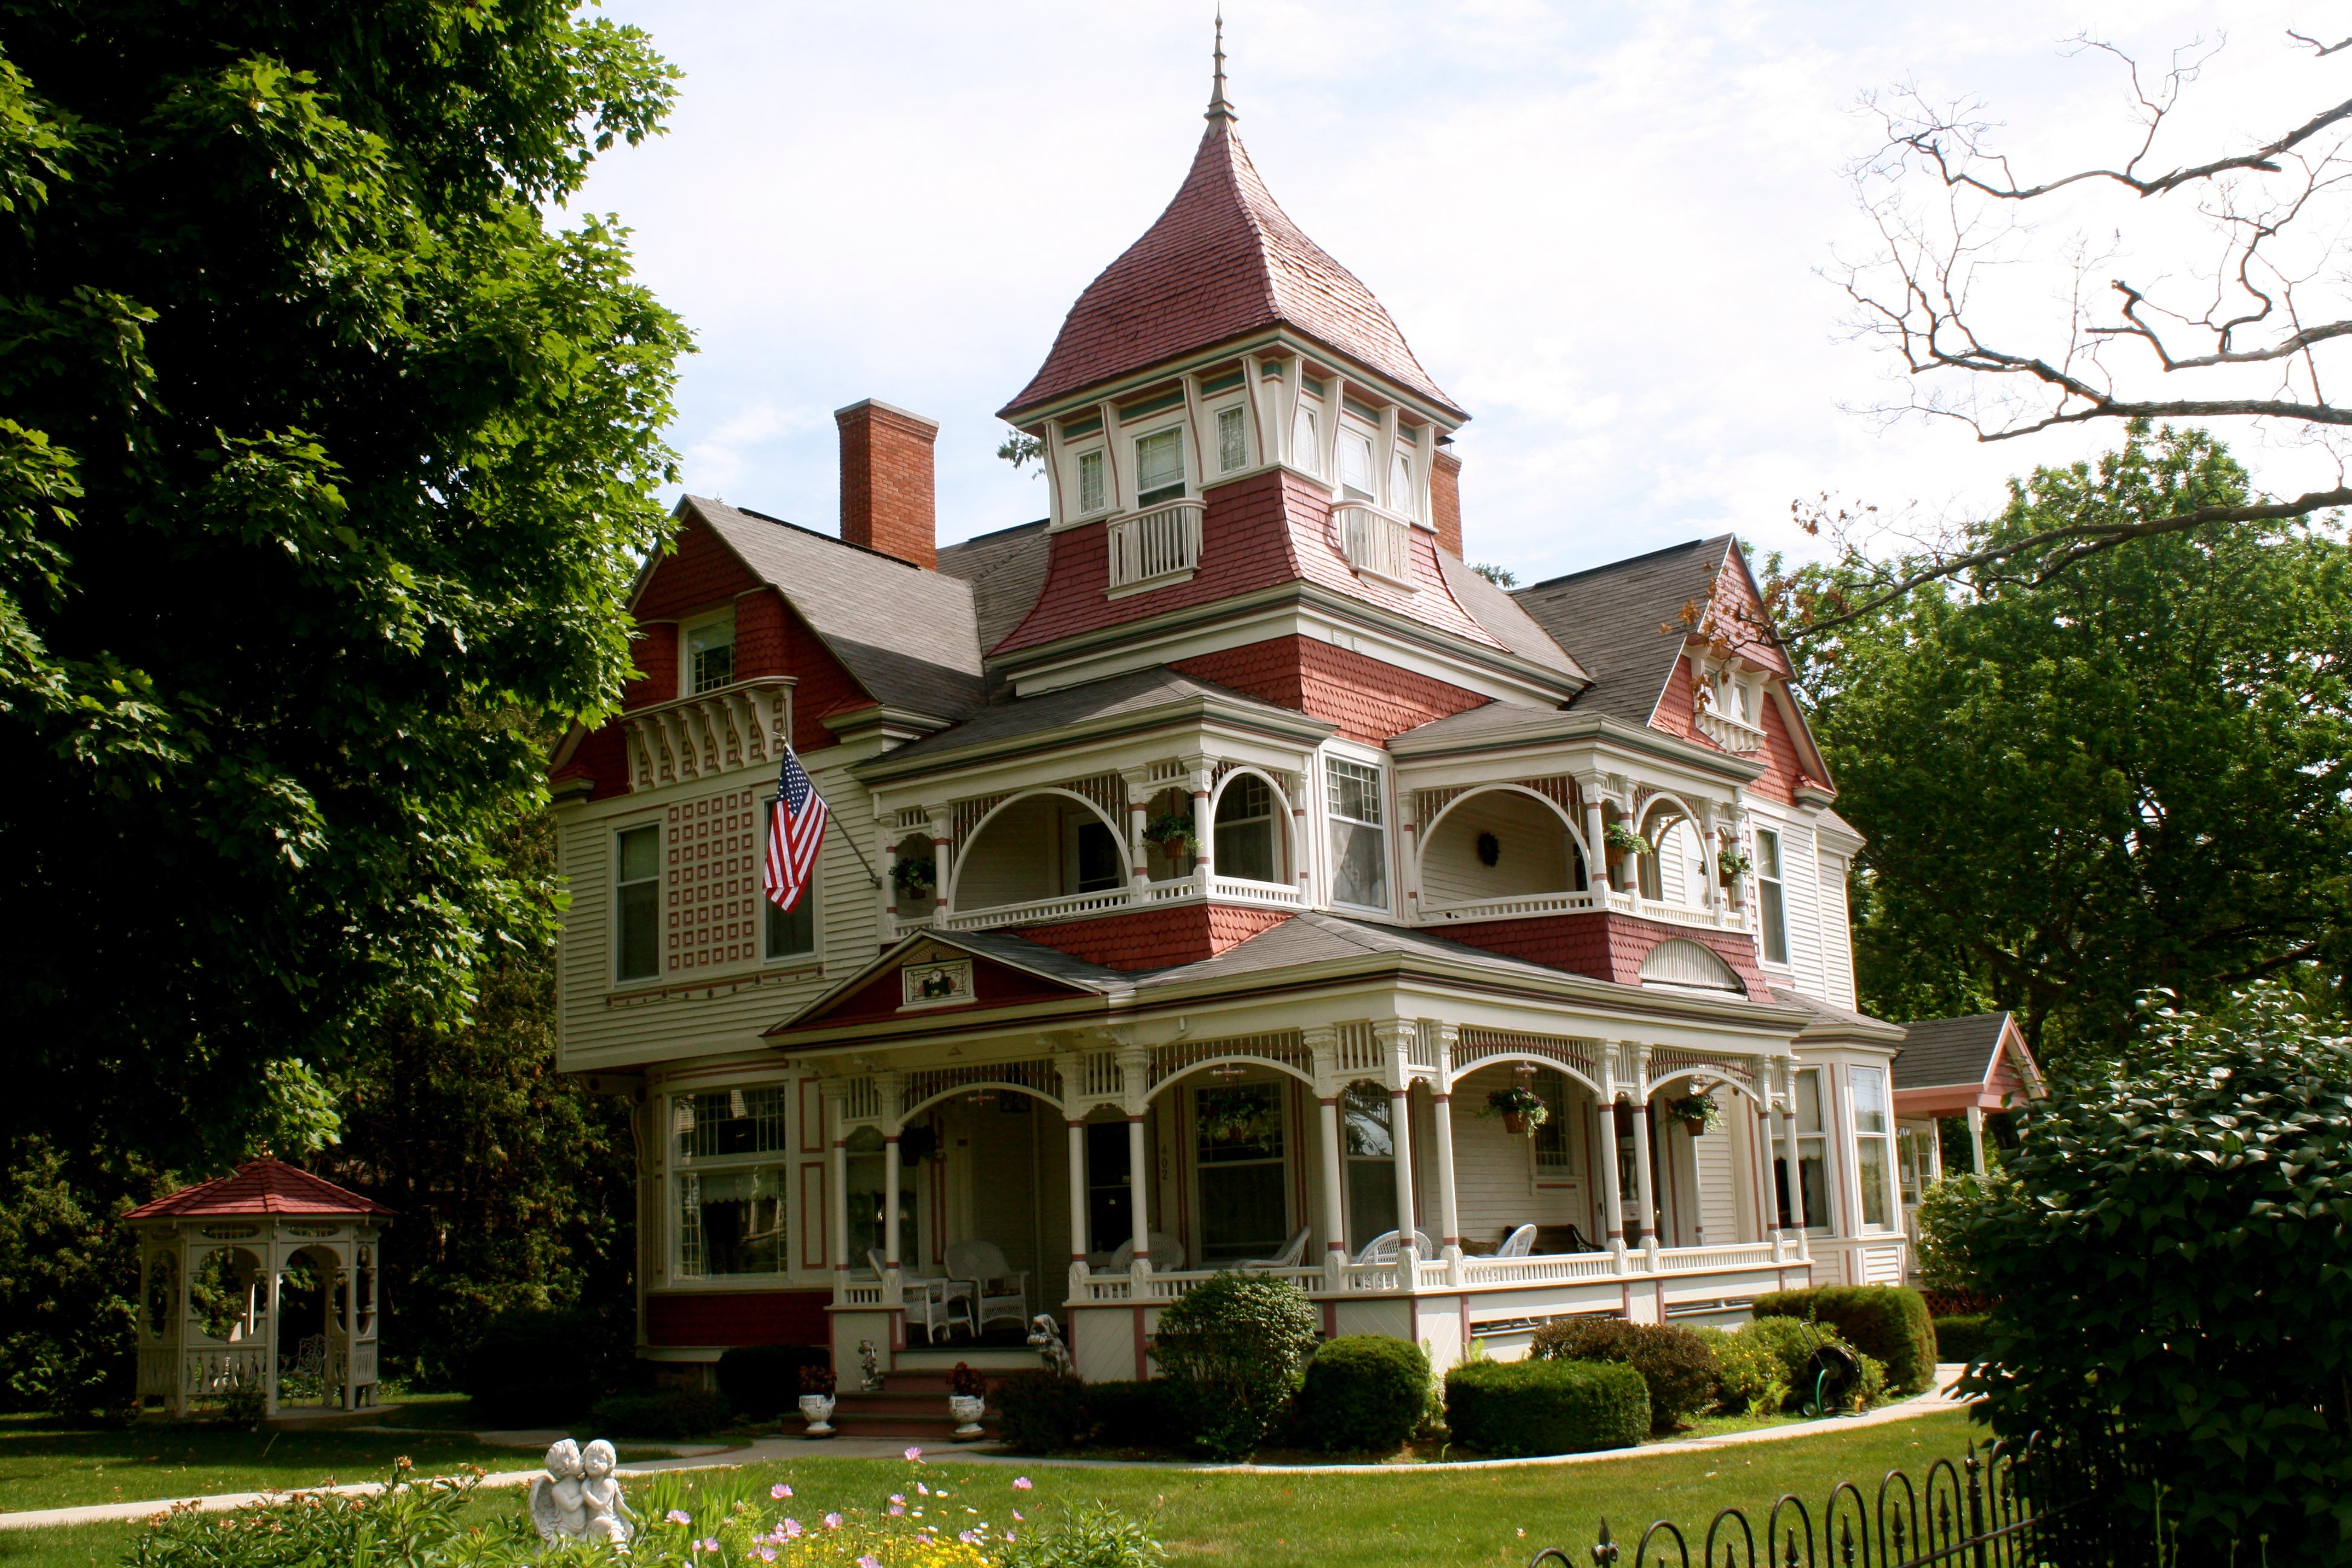 FileHenry Richardi House Grand Victorian BampBJPG